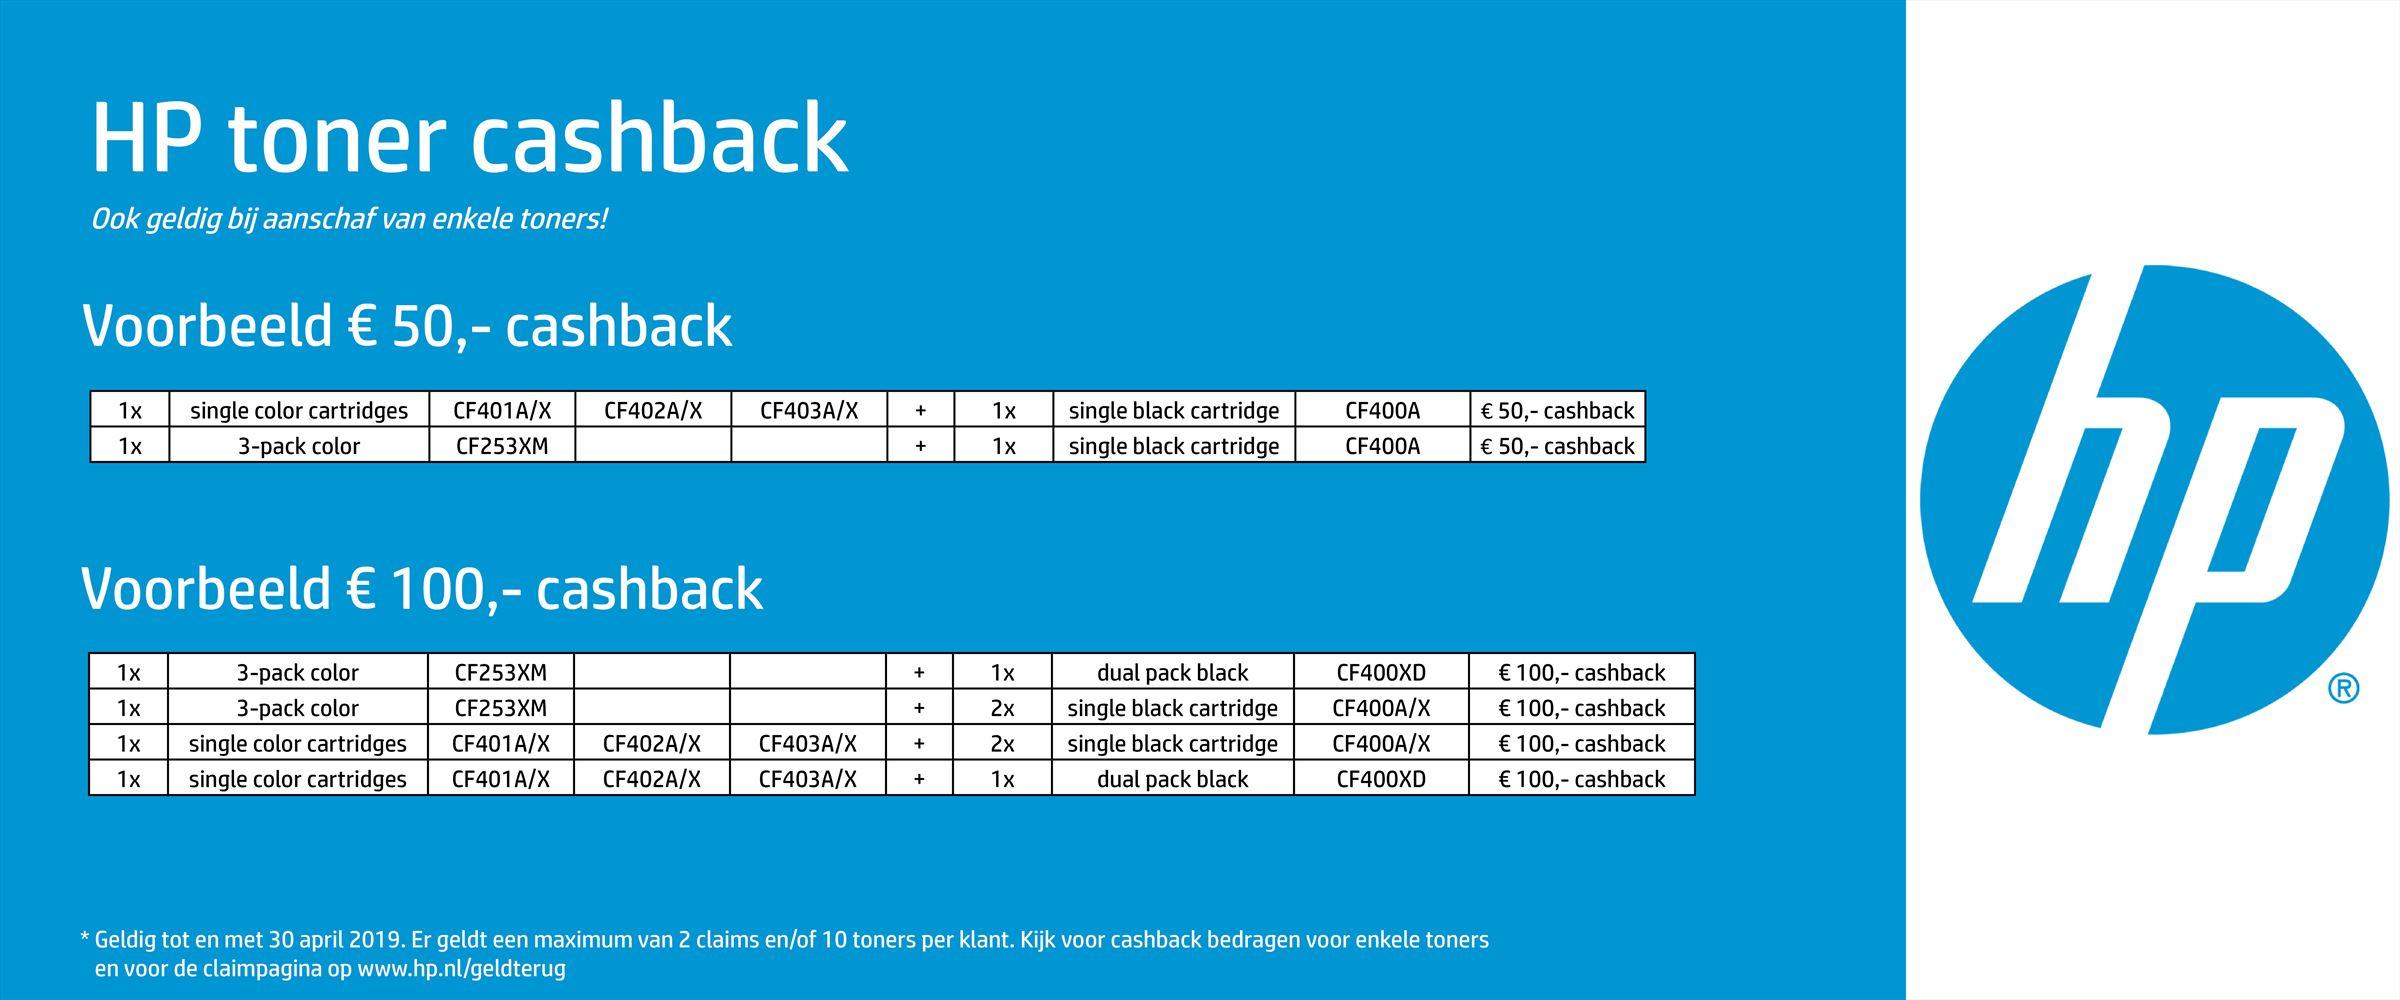 HP toner cashback artikellijst